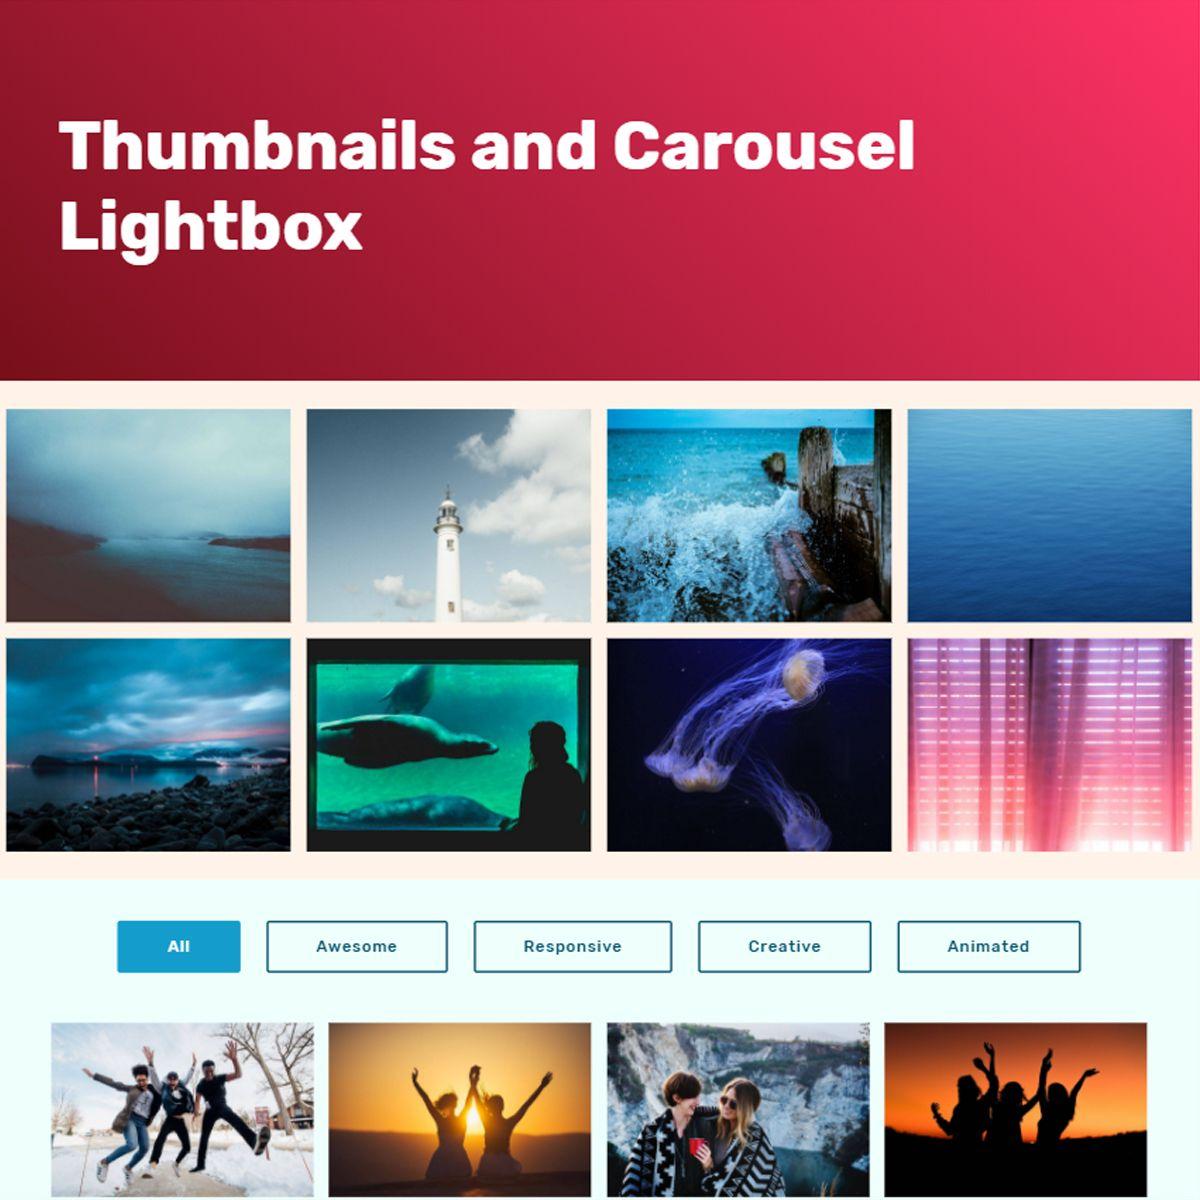 HTML5 Bootstrap Image Slideshow